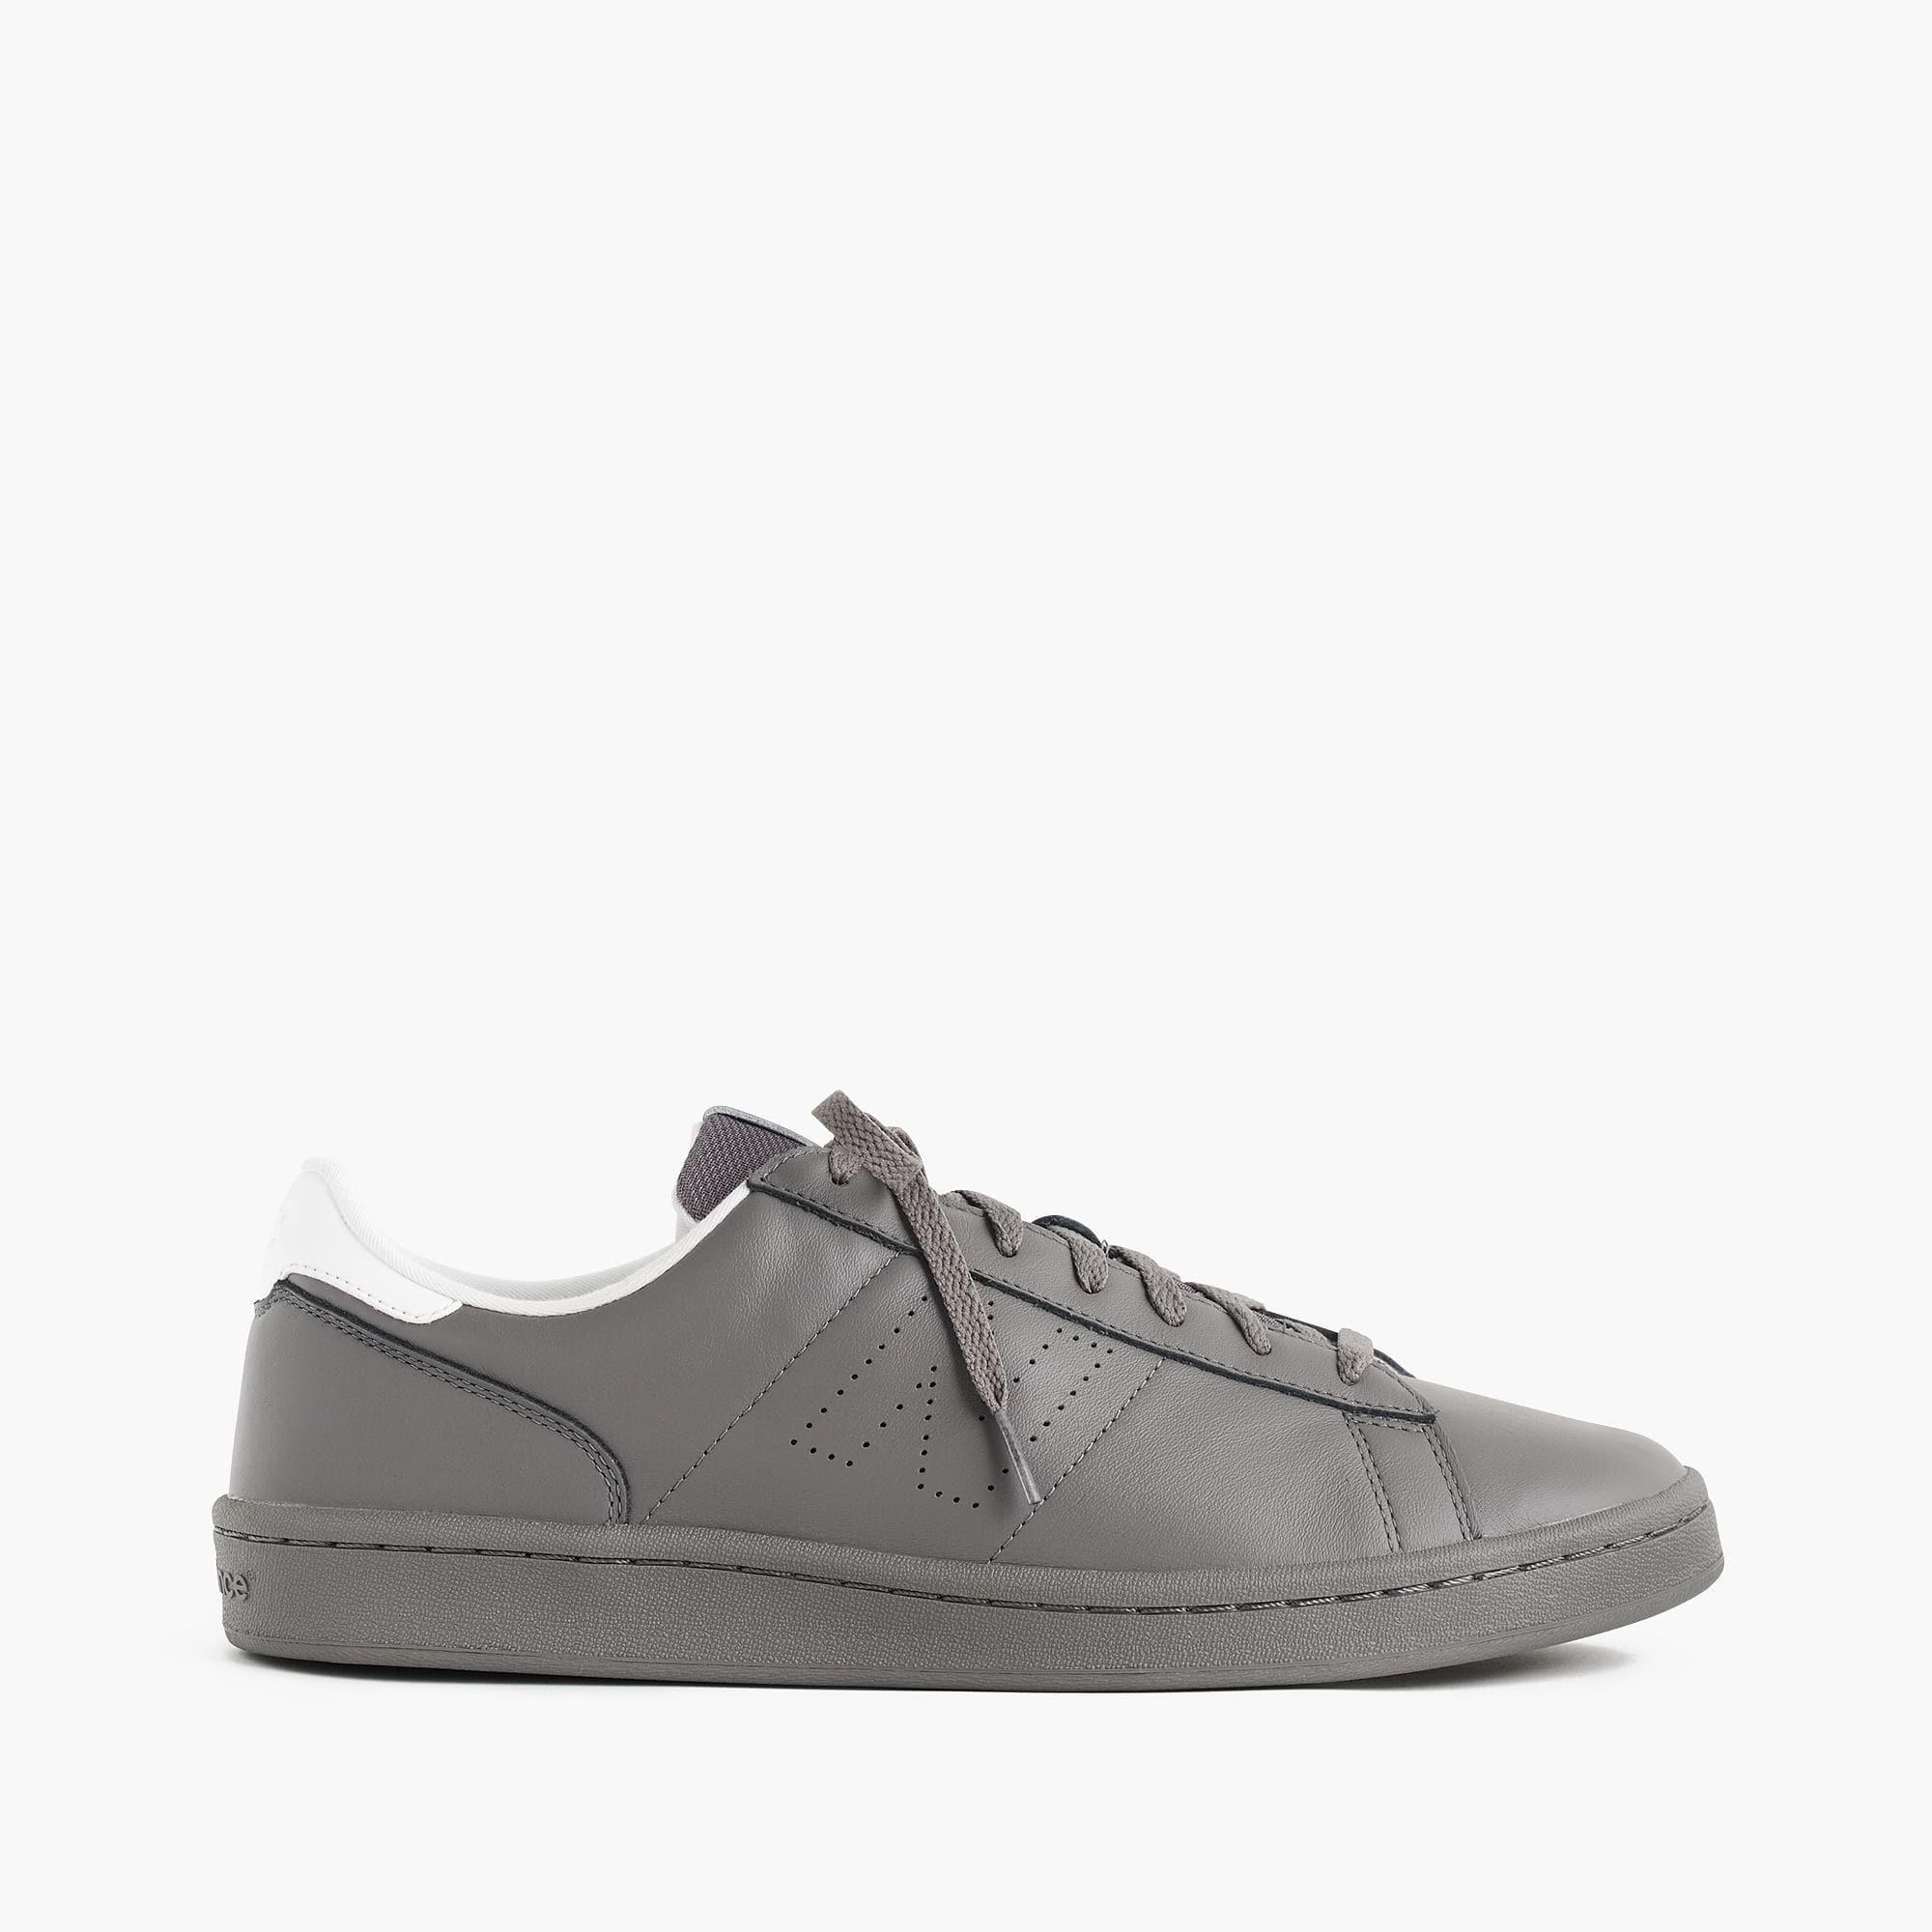 J Crew New Balance Tennis Shoes